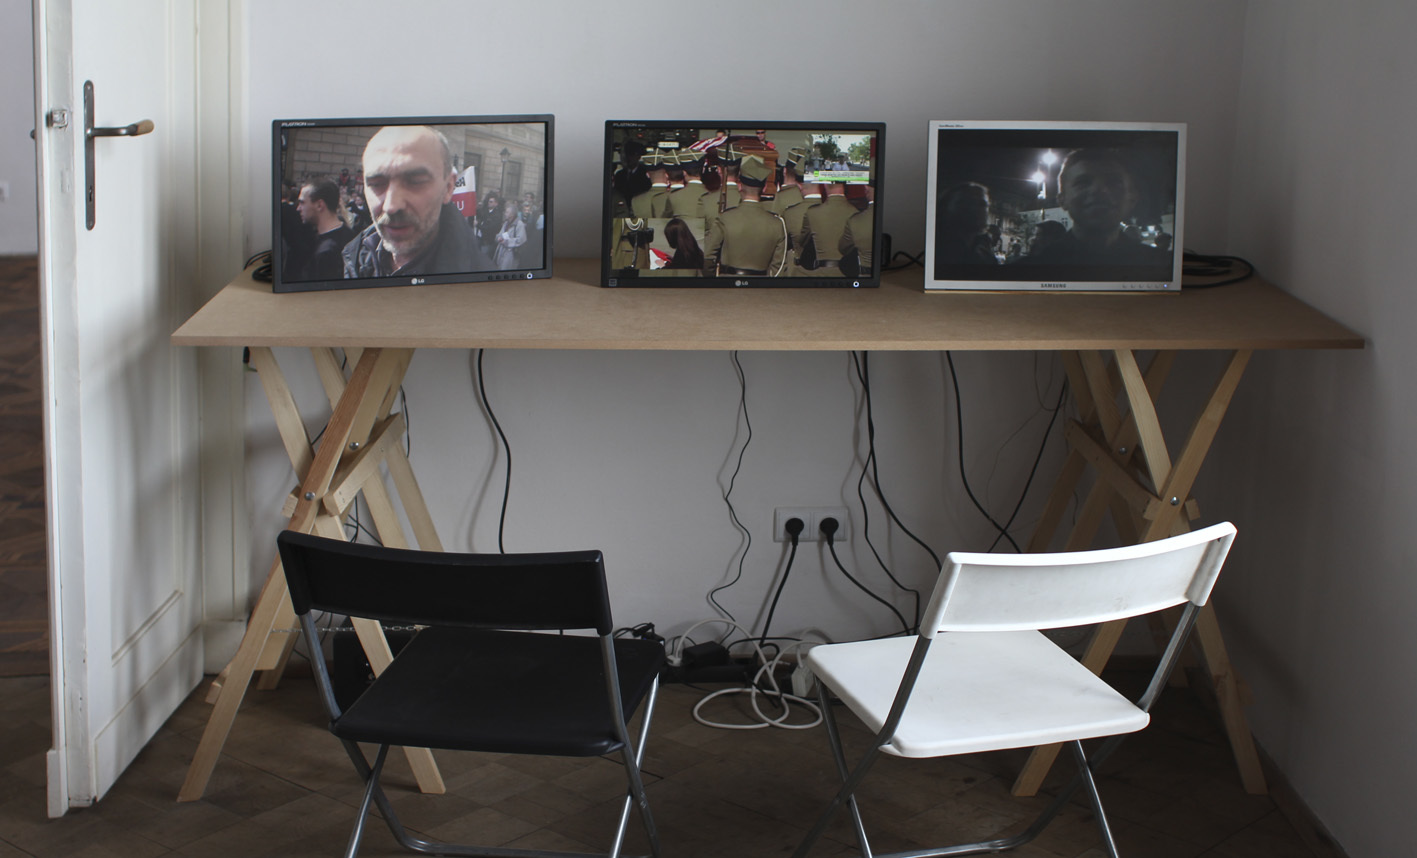 Instalacja wideo, Christoph Draeger, The Men who Stole the Moon, 2010, wideo HD, 26 miniA. Żmijewski, Katastrofa, 2010, wideo HD, 56 min